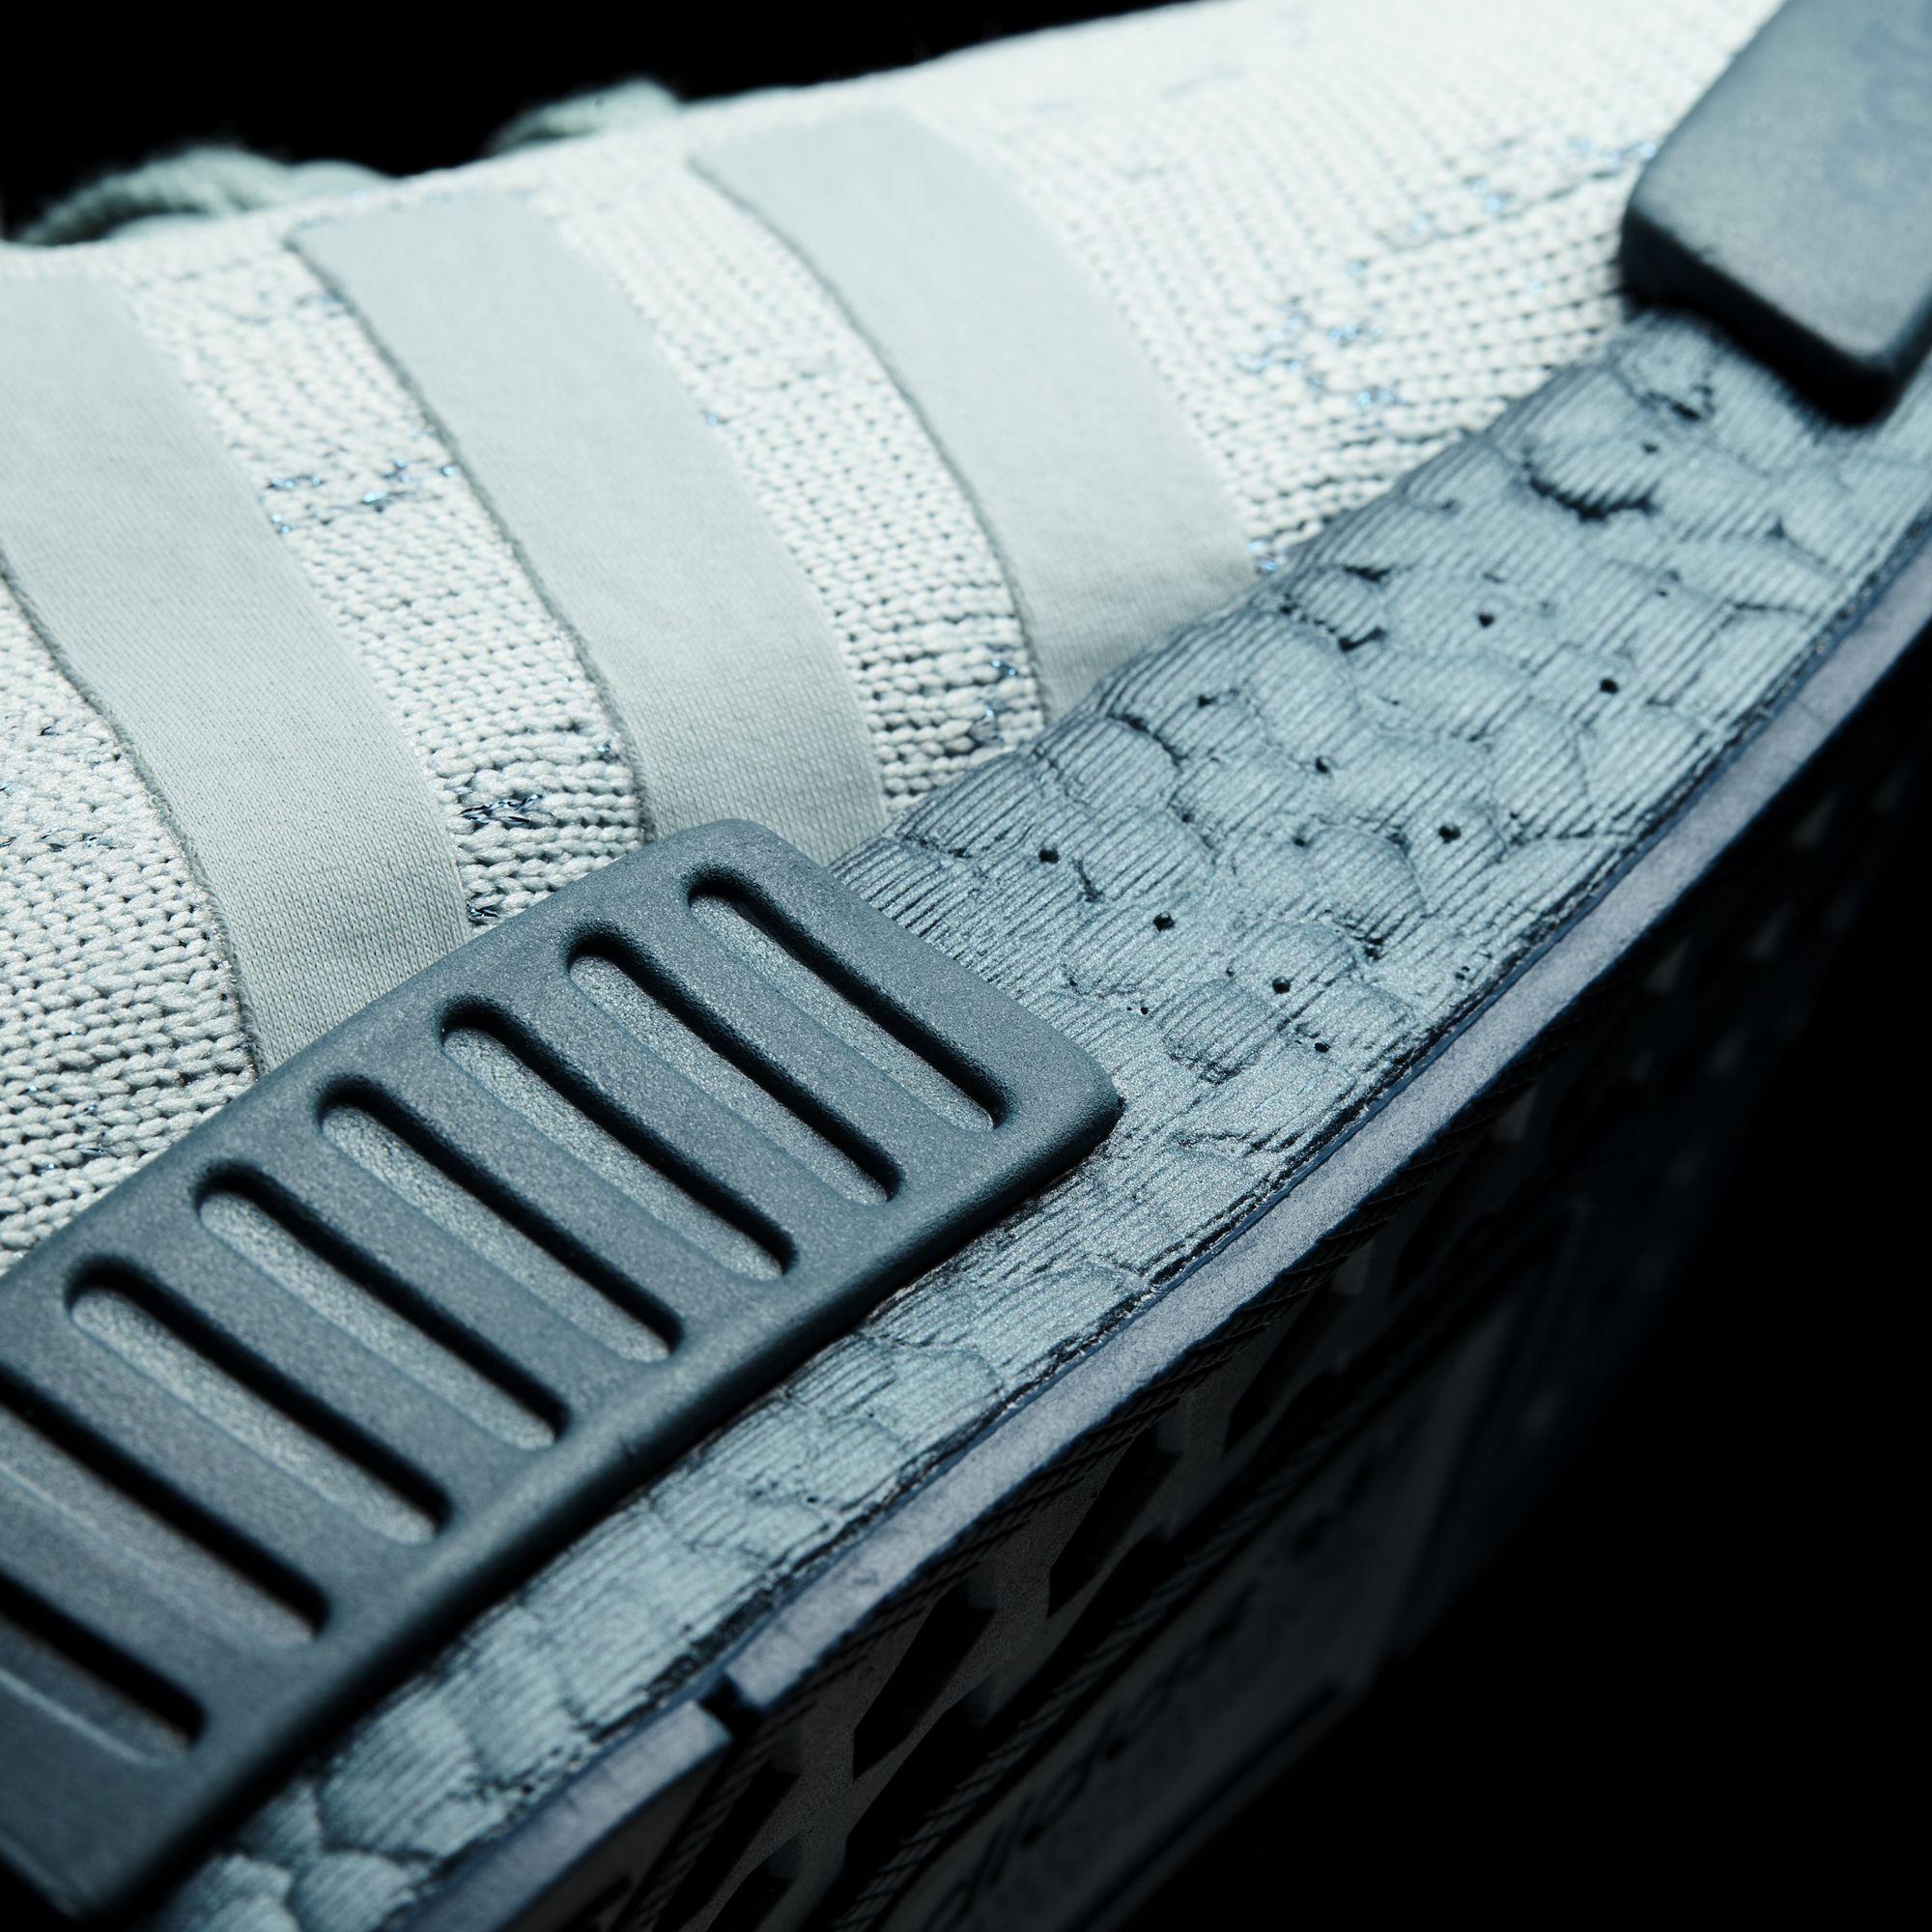 CG3601 adidas NMD R1 Primeknit Tactile Green 4